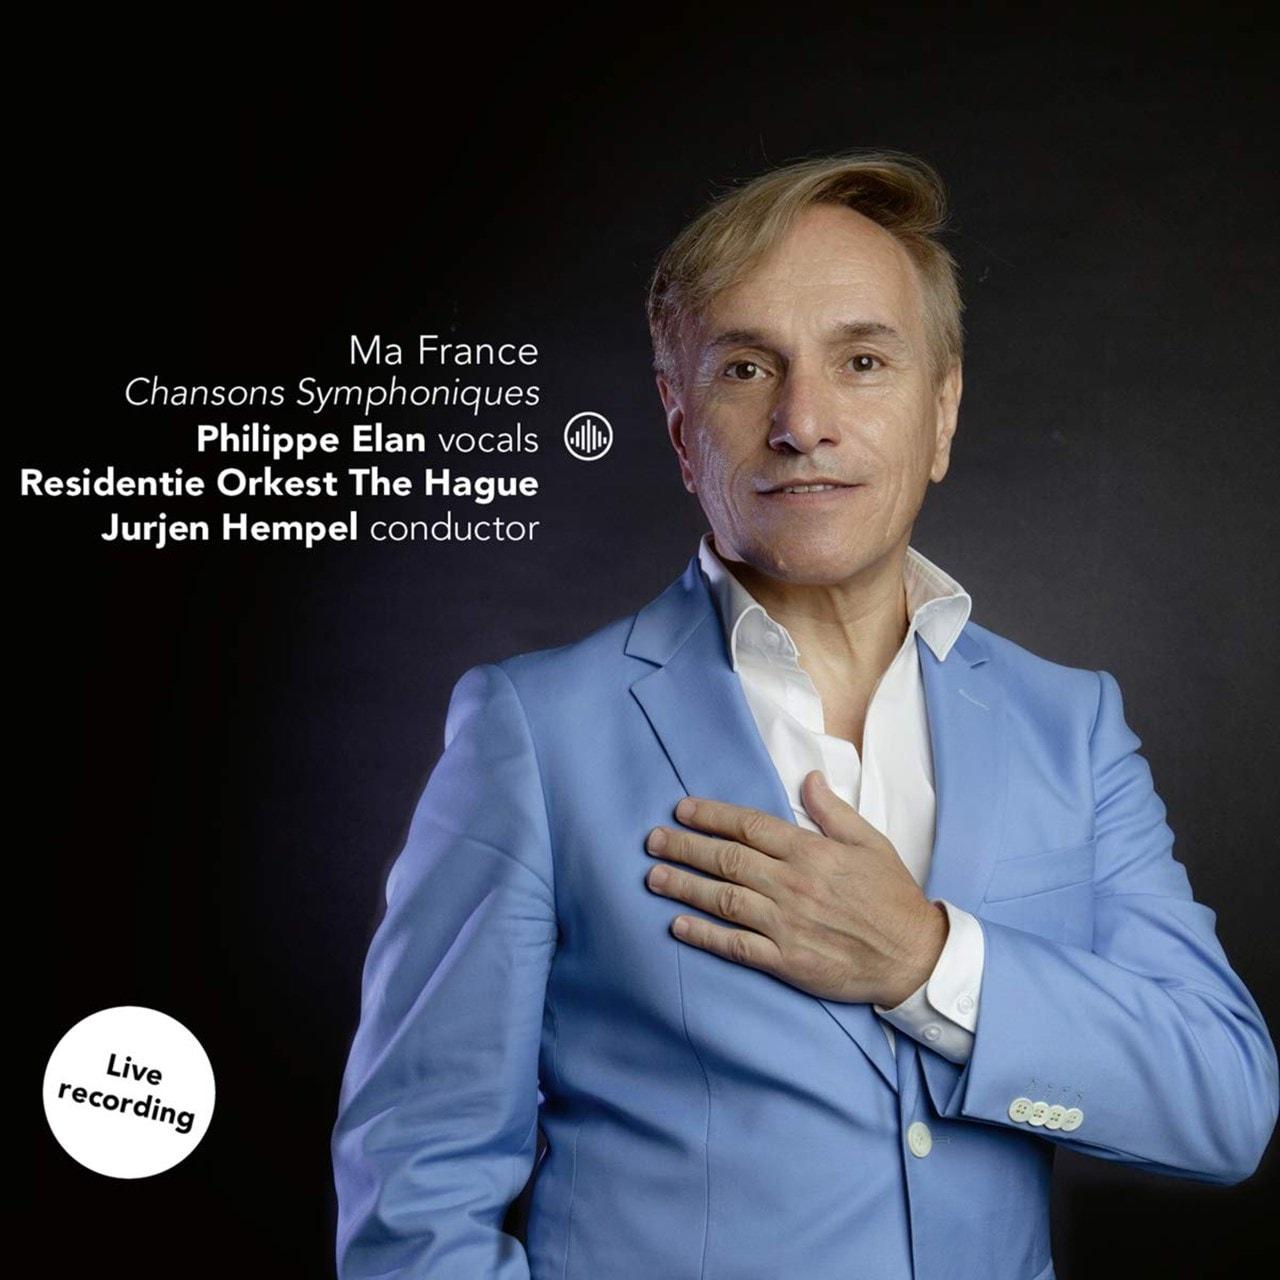 Ma France: Chansons Symphoniques - 1